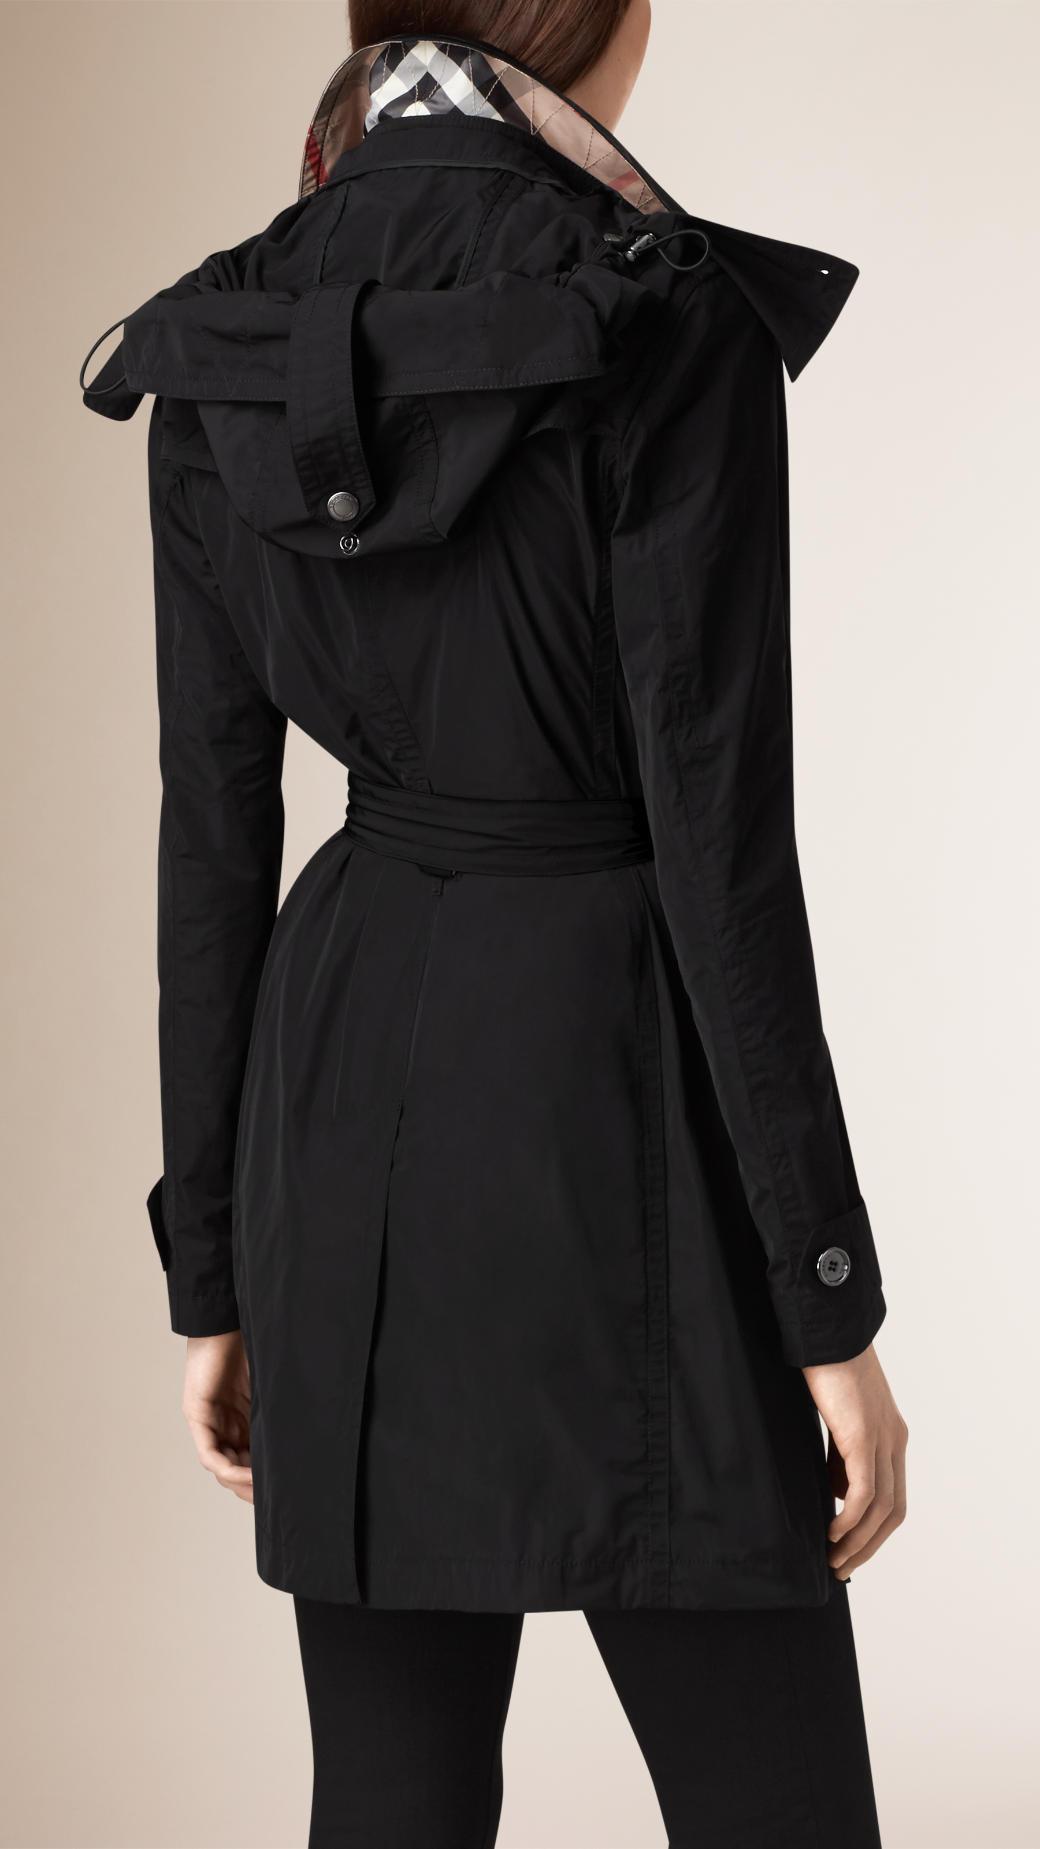 Lyst - Burberry Hooded Taffeta Trench Coat in Black